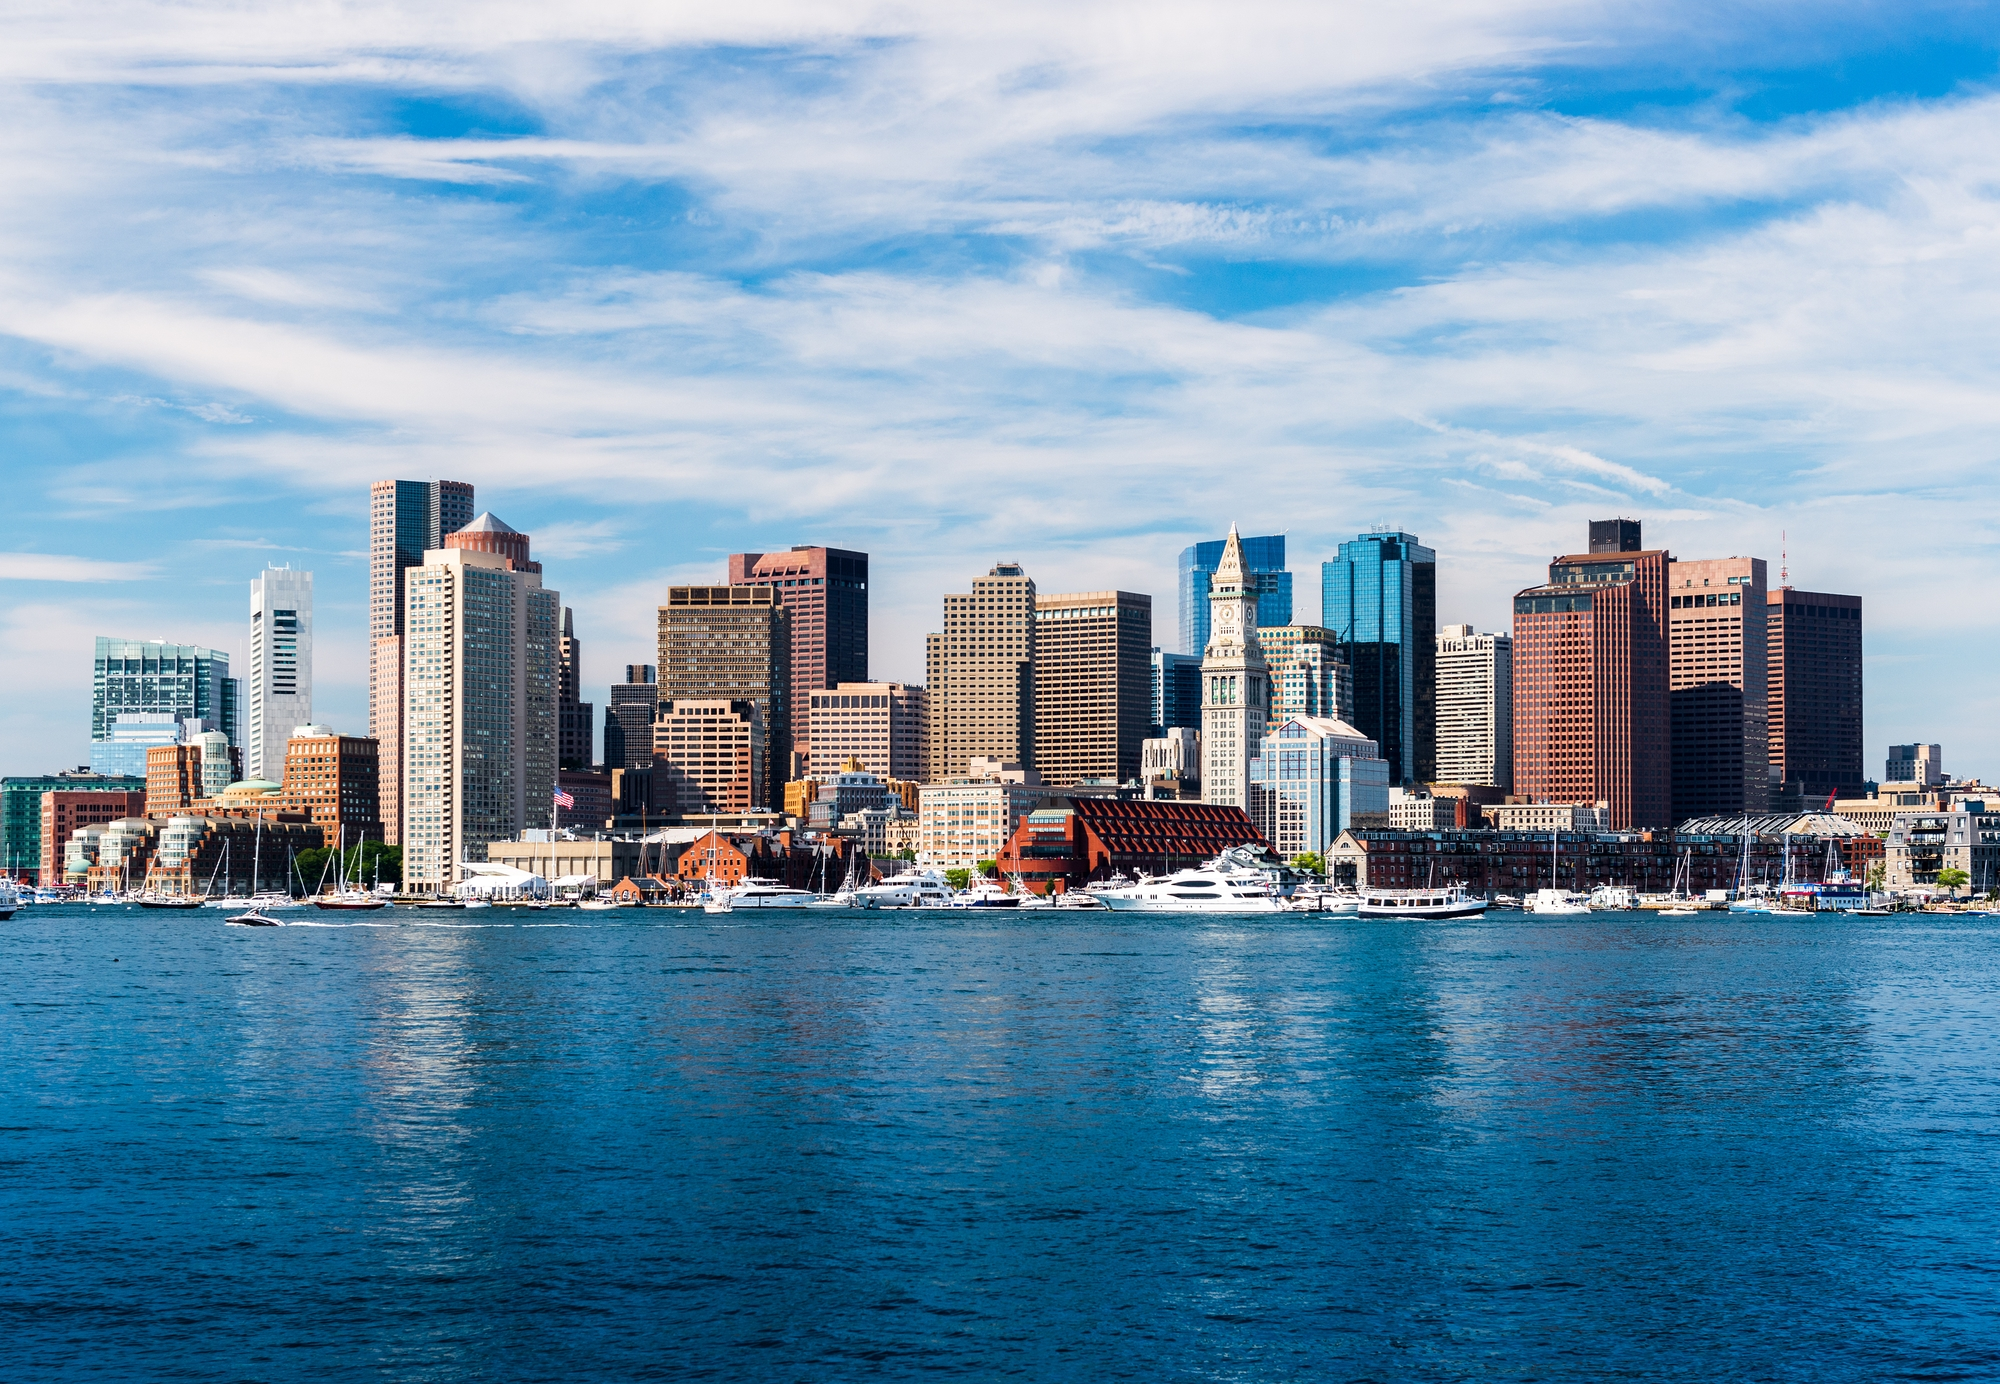 079930655-panoramic-view-boston-skyline-.jpeg